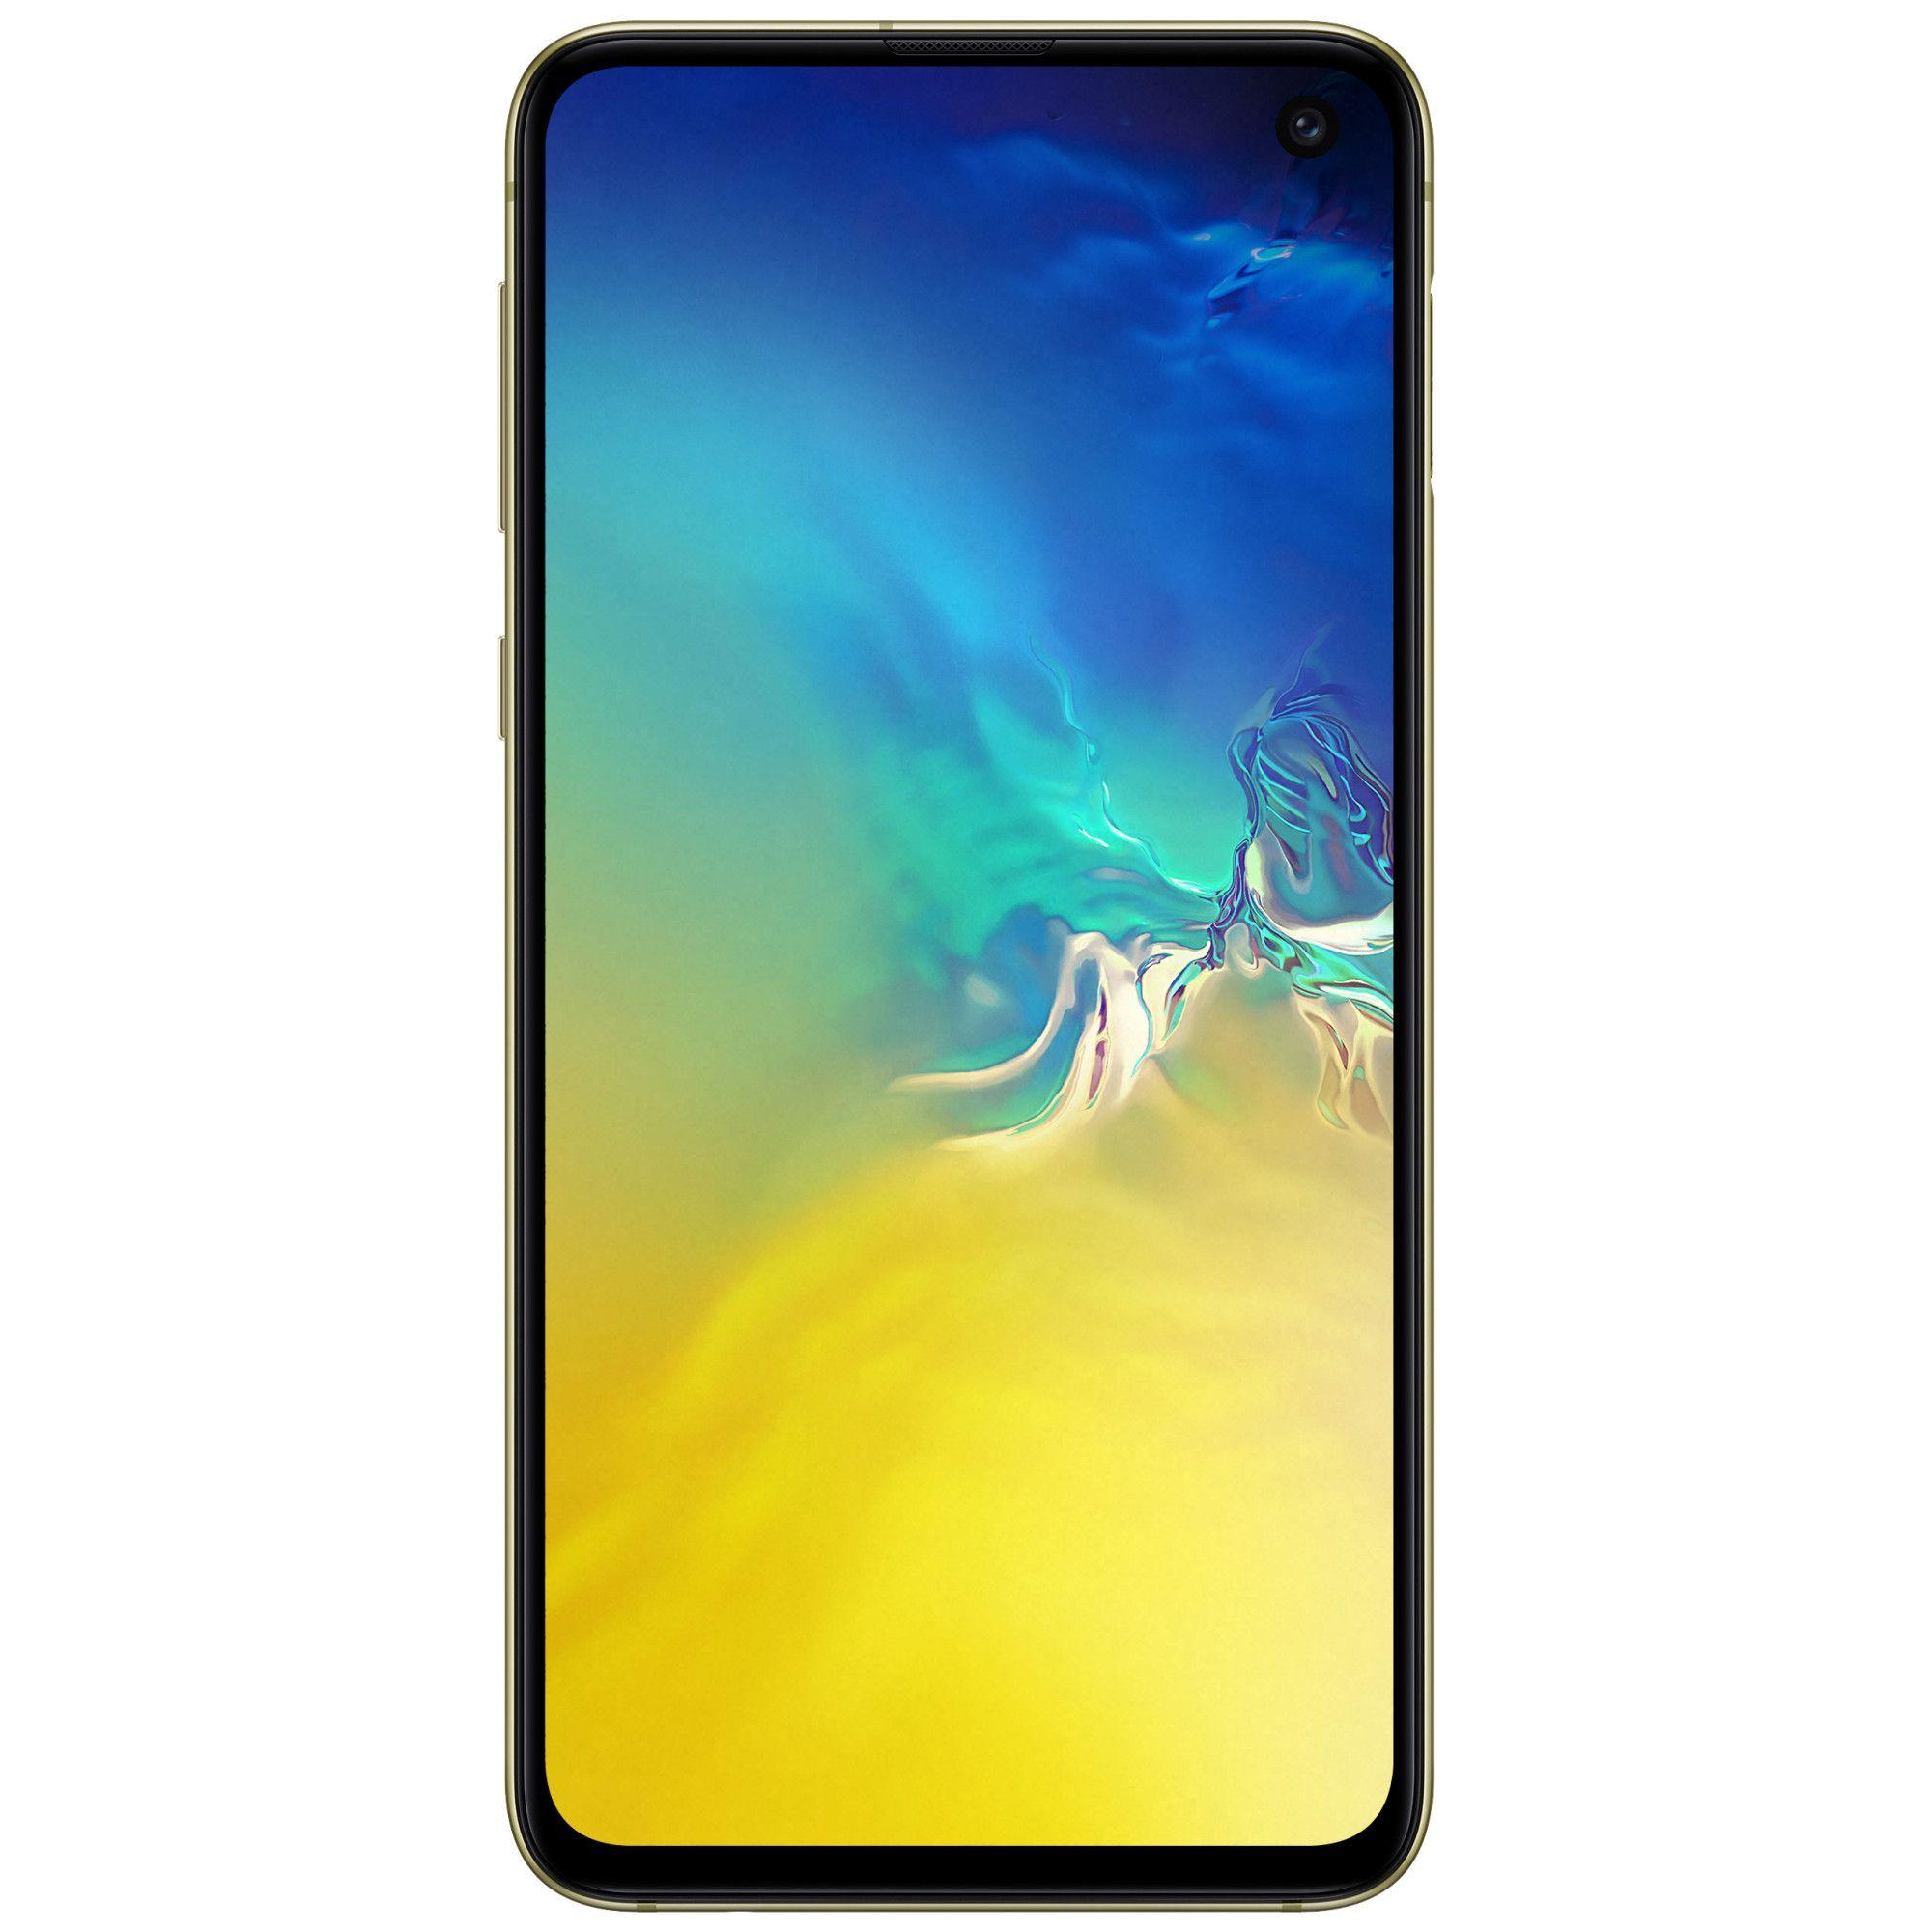 Telefon mobil Samsung Galaxy S10e, Dual SIM, 128GB, 6GB RAM, 4G, Canary Yellow